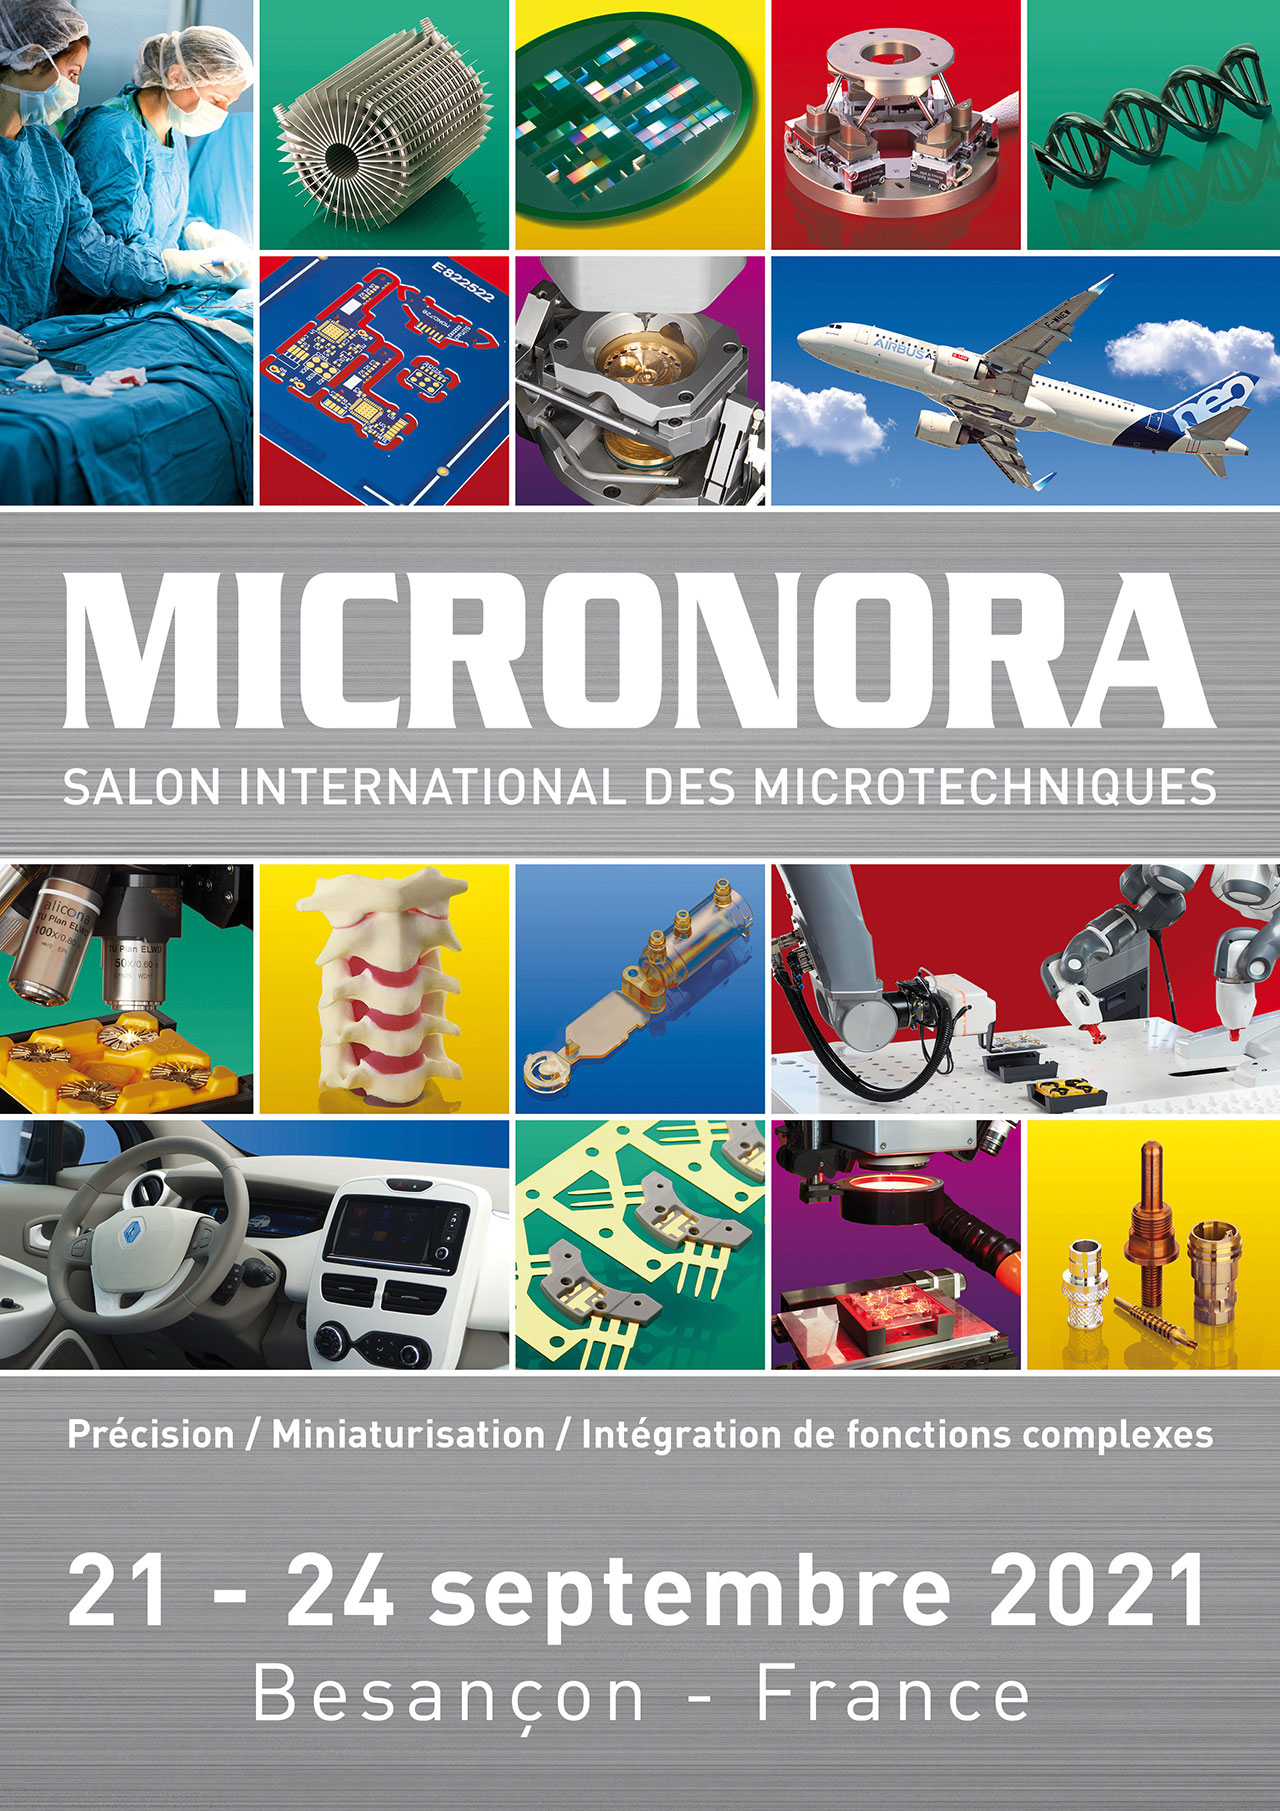 Report du salon Micronora